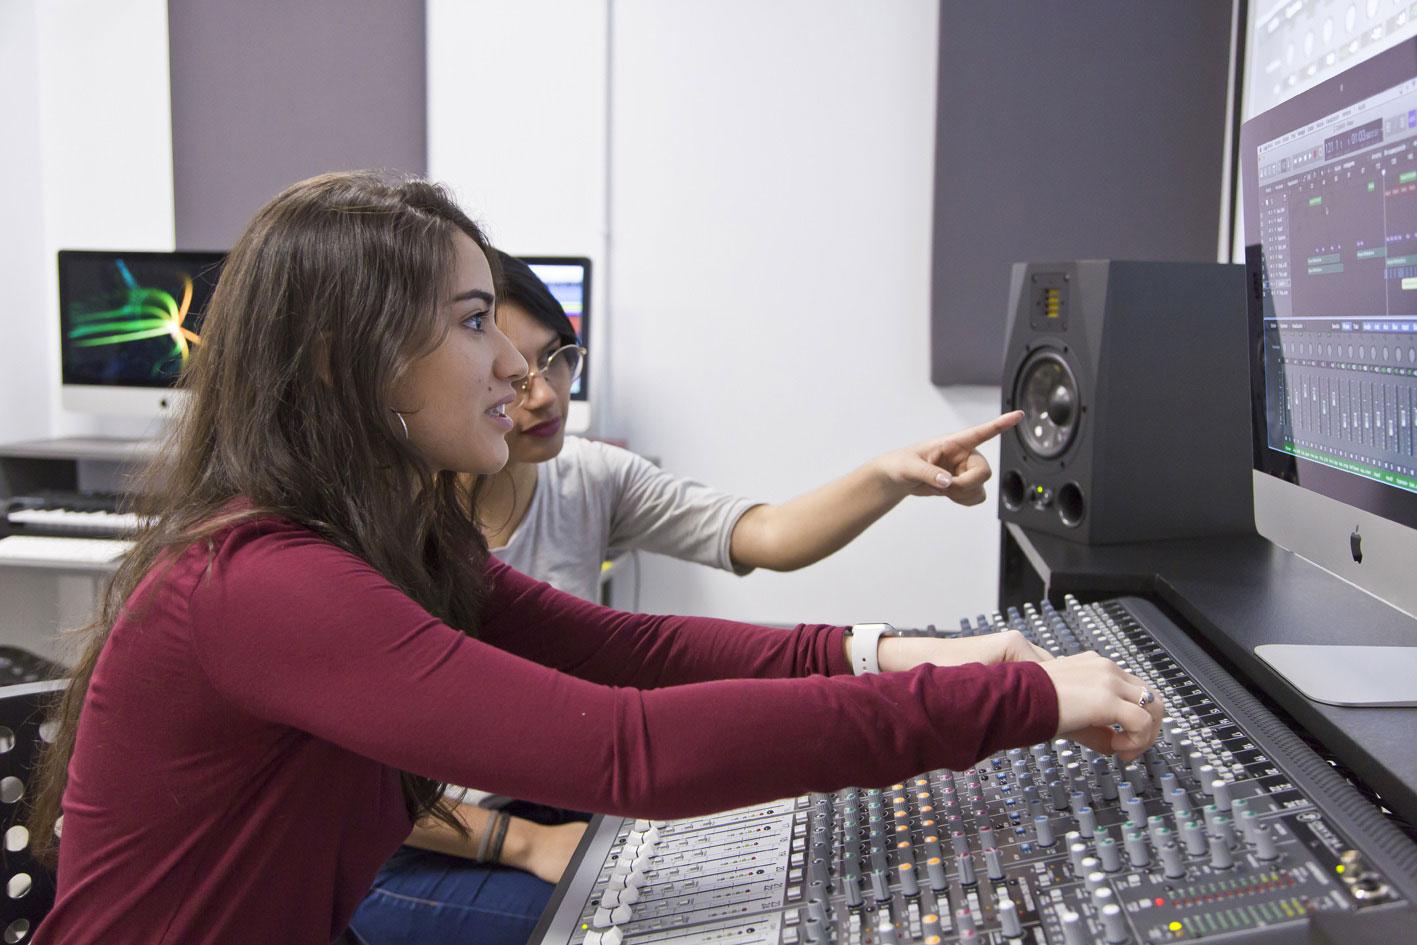 master-curso-produccion-musical-avanzada-madrid-djp-music-school